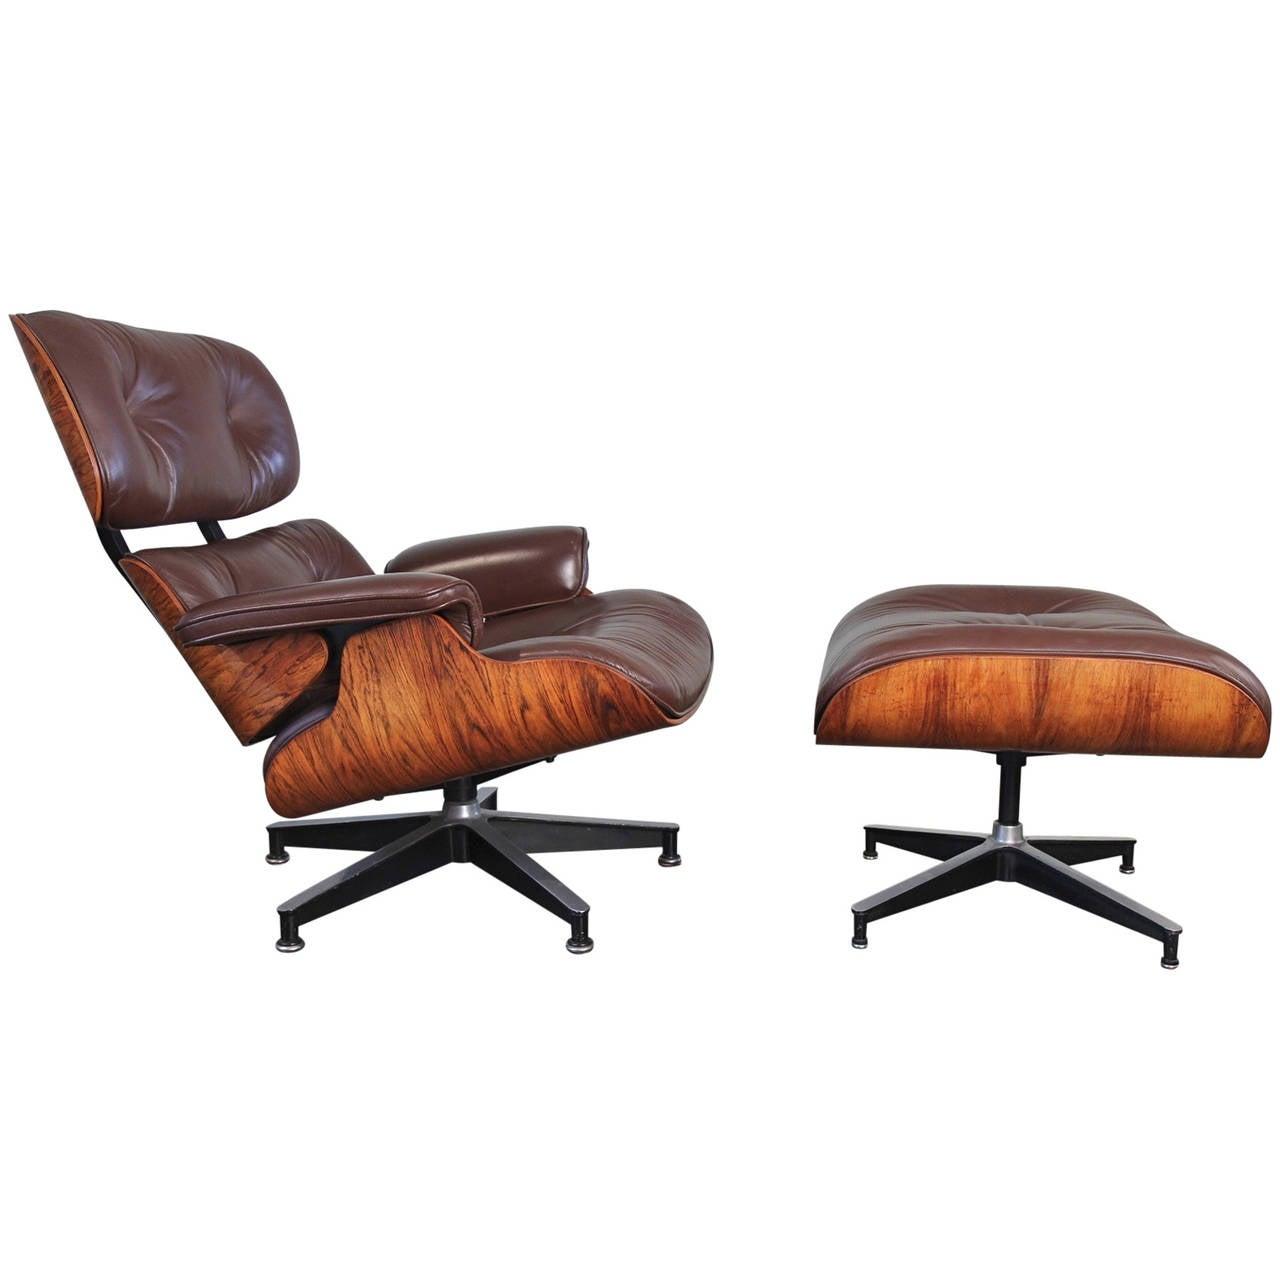 Eames 670 Lounge Chair and 671 Ottoman at 1stdibs